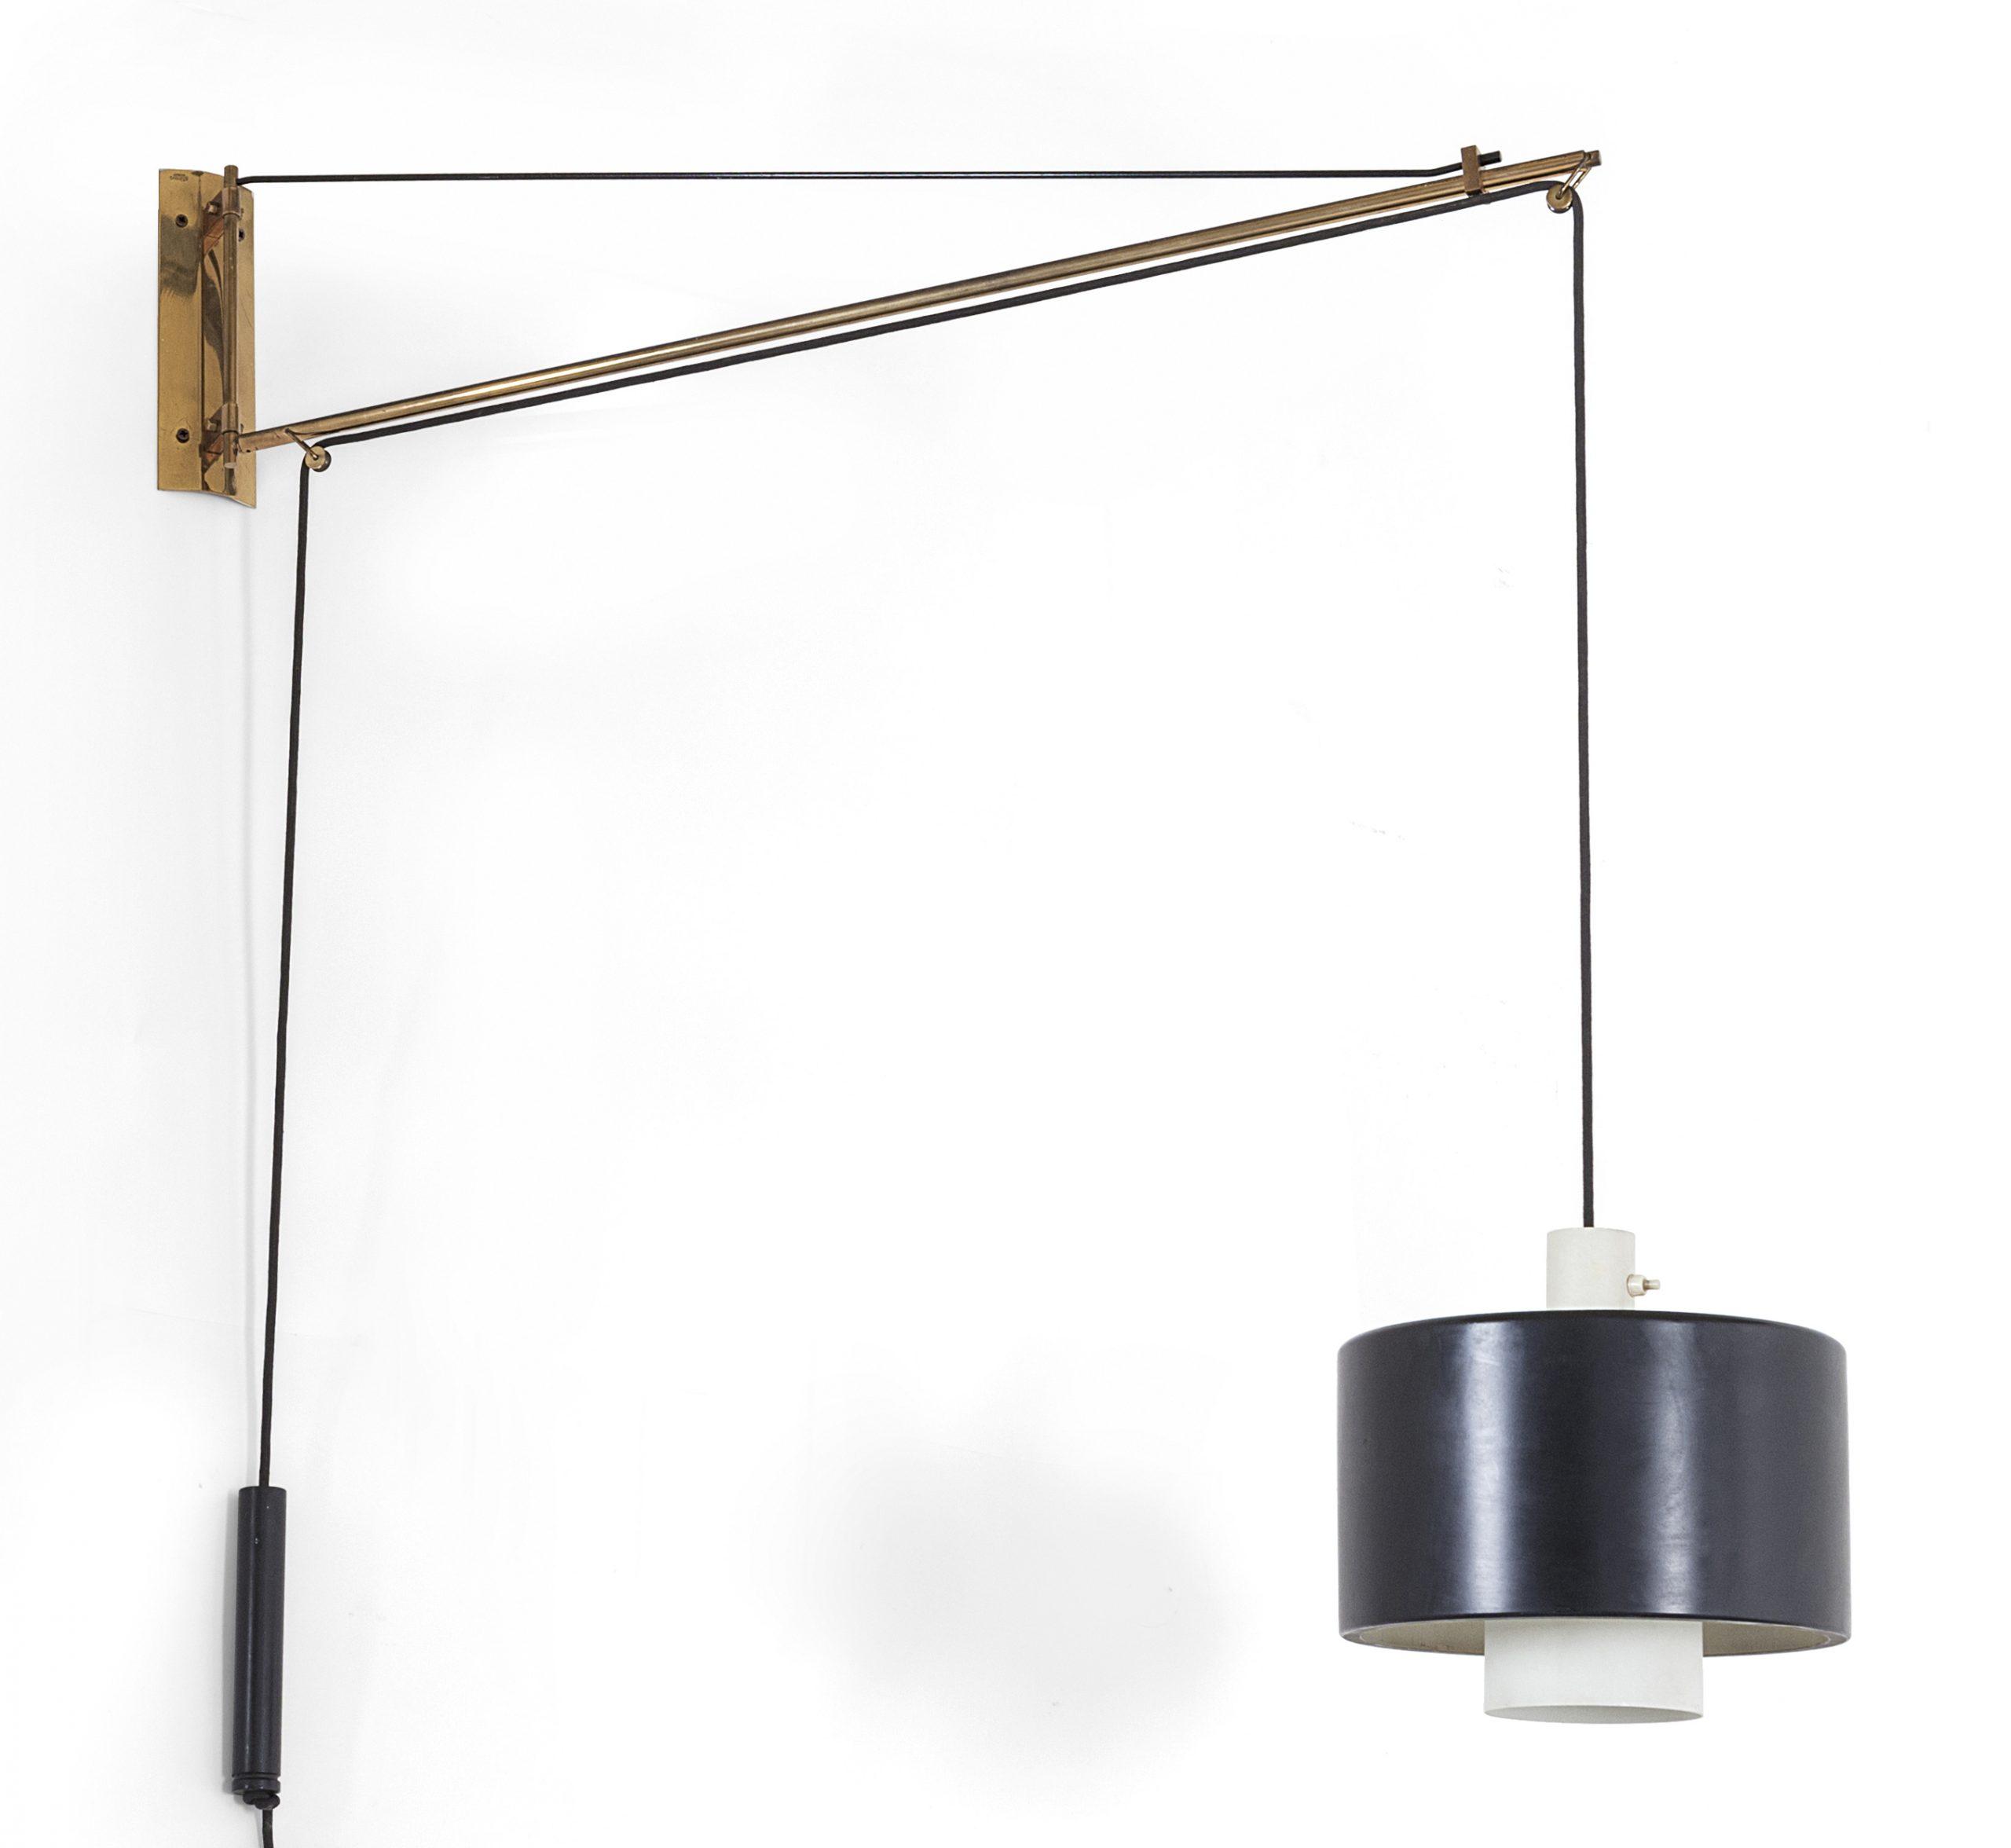 Wall Light Model 2061 by Stilnovo | soyun k.